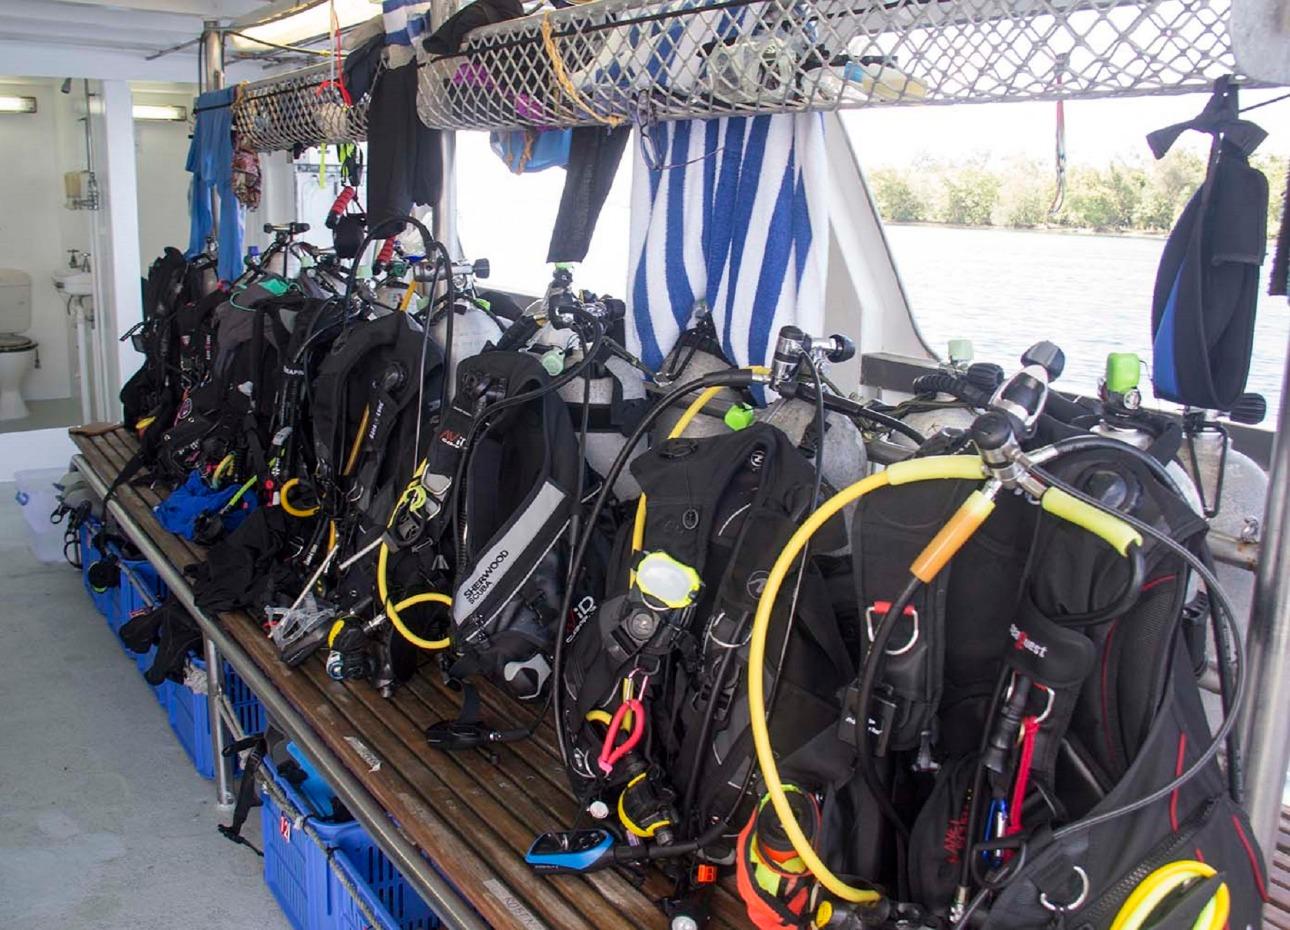 M/V Solomons PNG Master, Diving Equipment, image